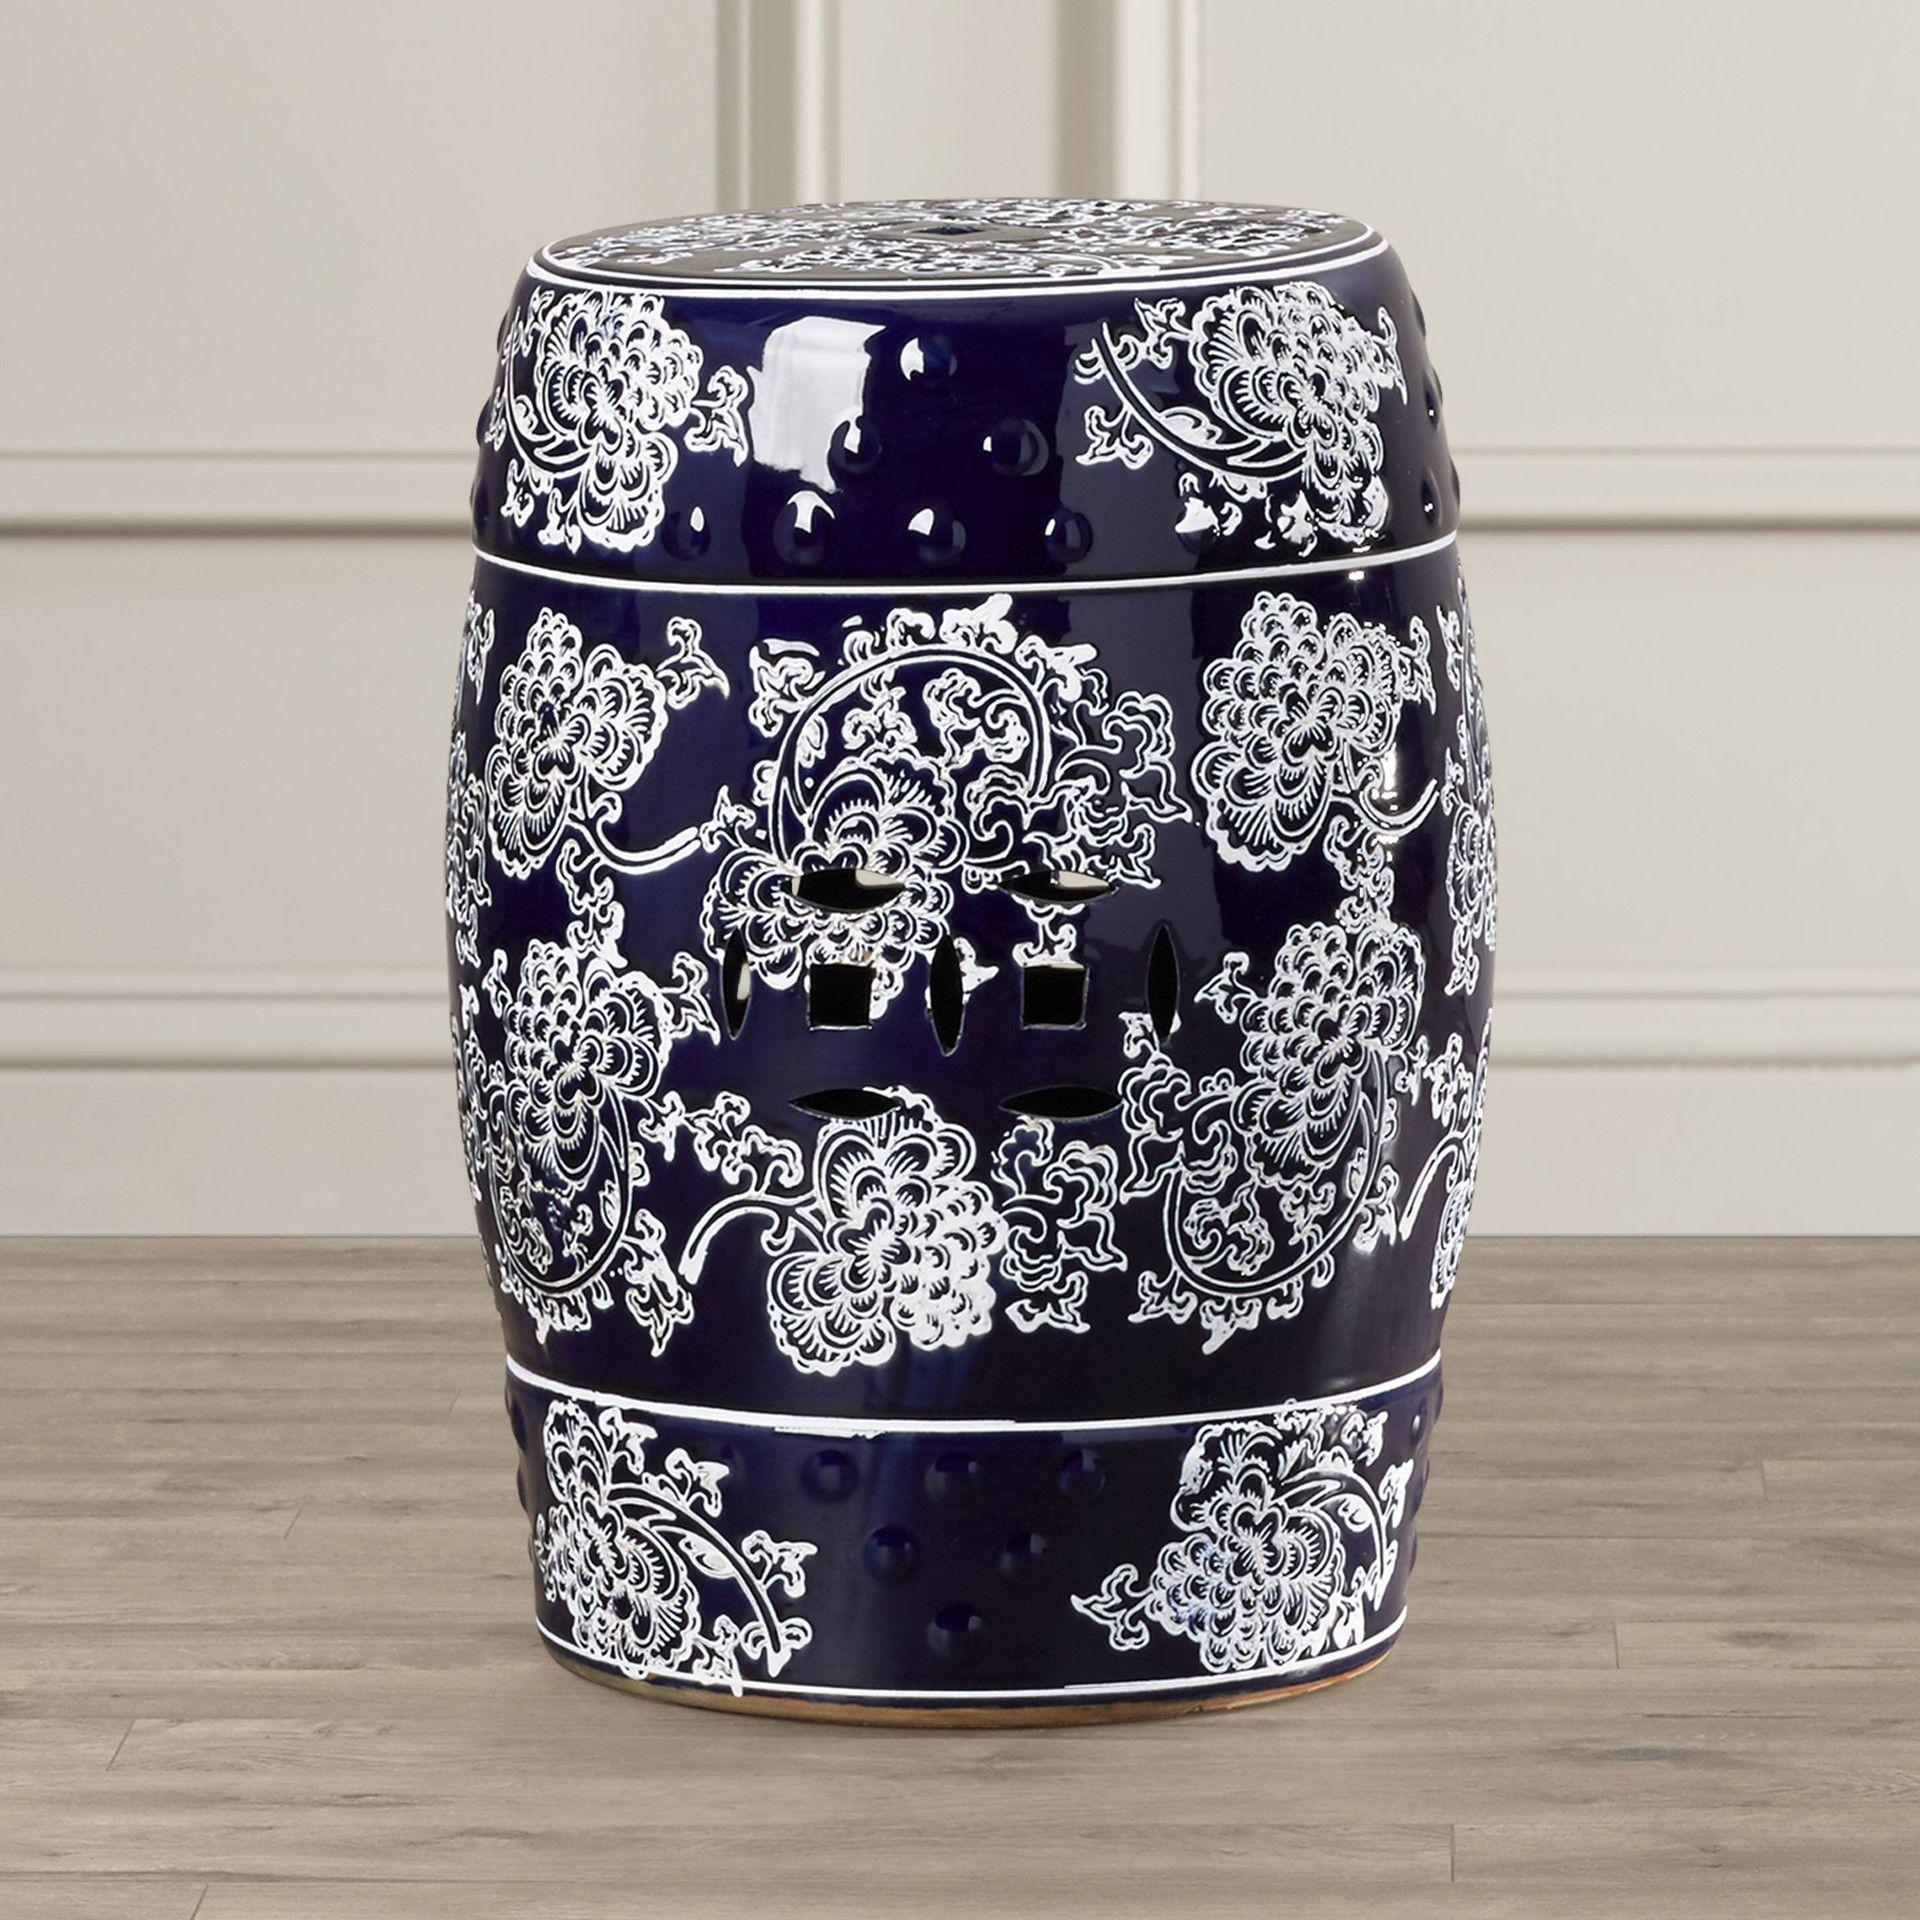 Morgan Ceramic Garden Stool Ceramic Garden Stools Stool Home Decor